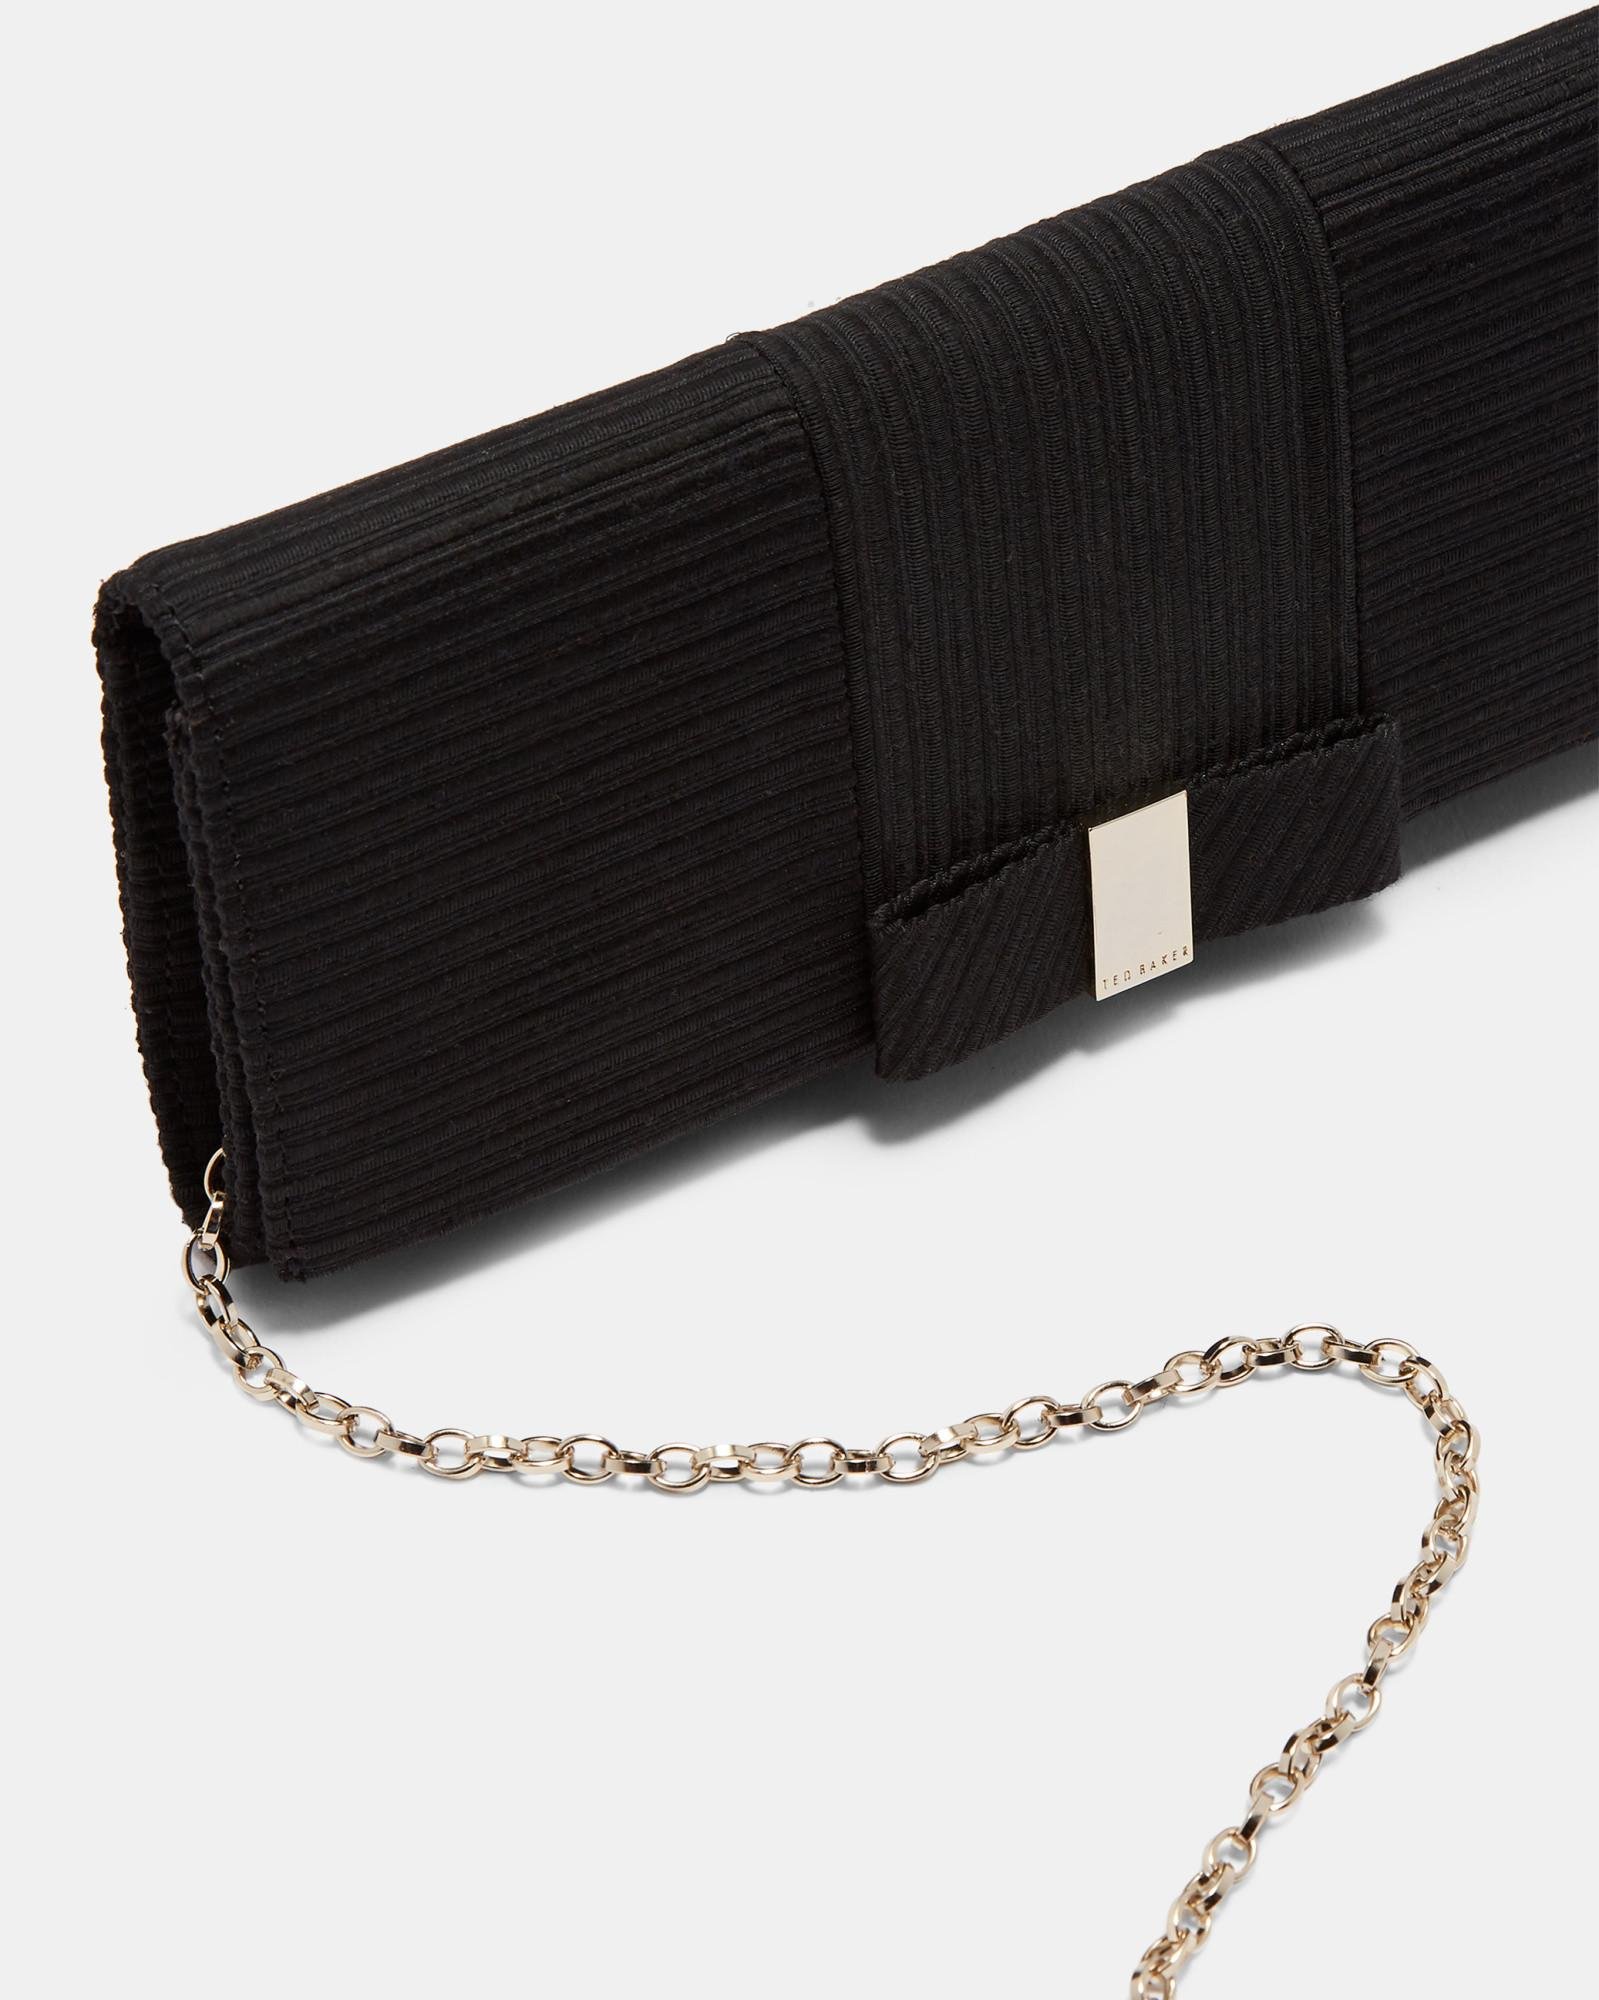 108f631747 Ted Baker - Black Flat Bow Evening Bag - Lyst. View fullscreen